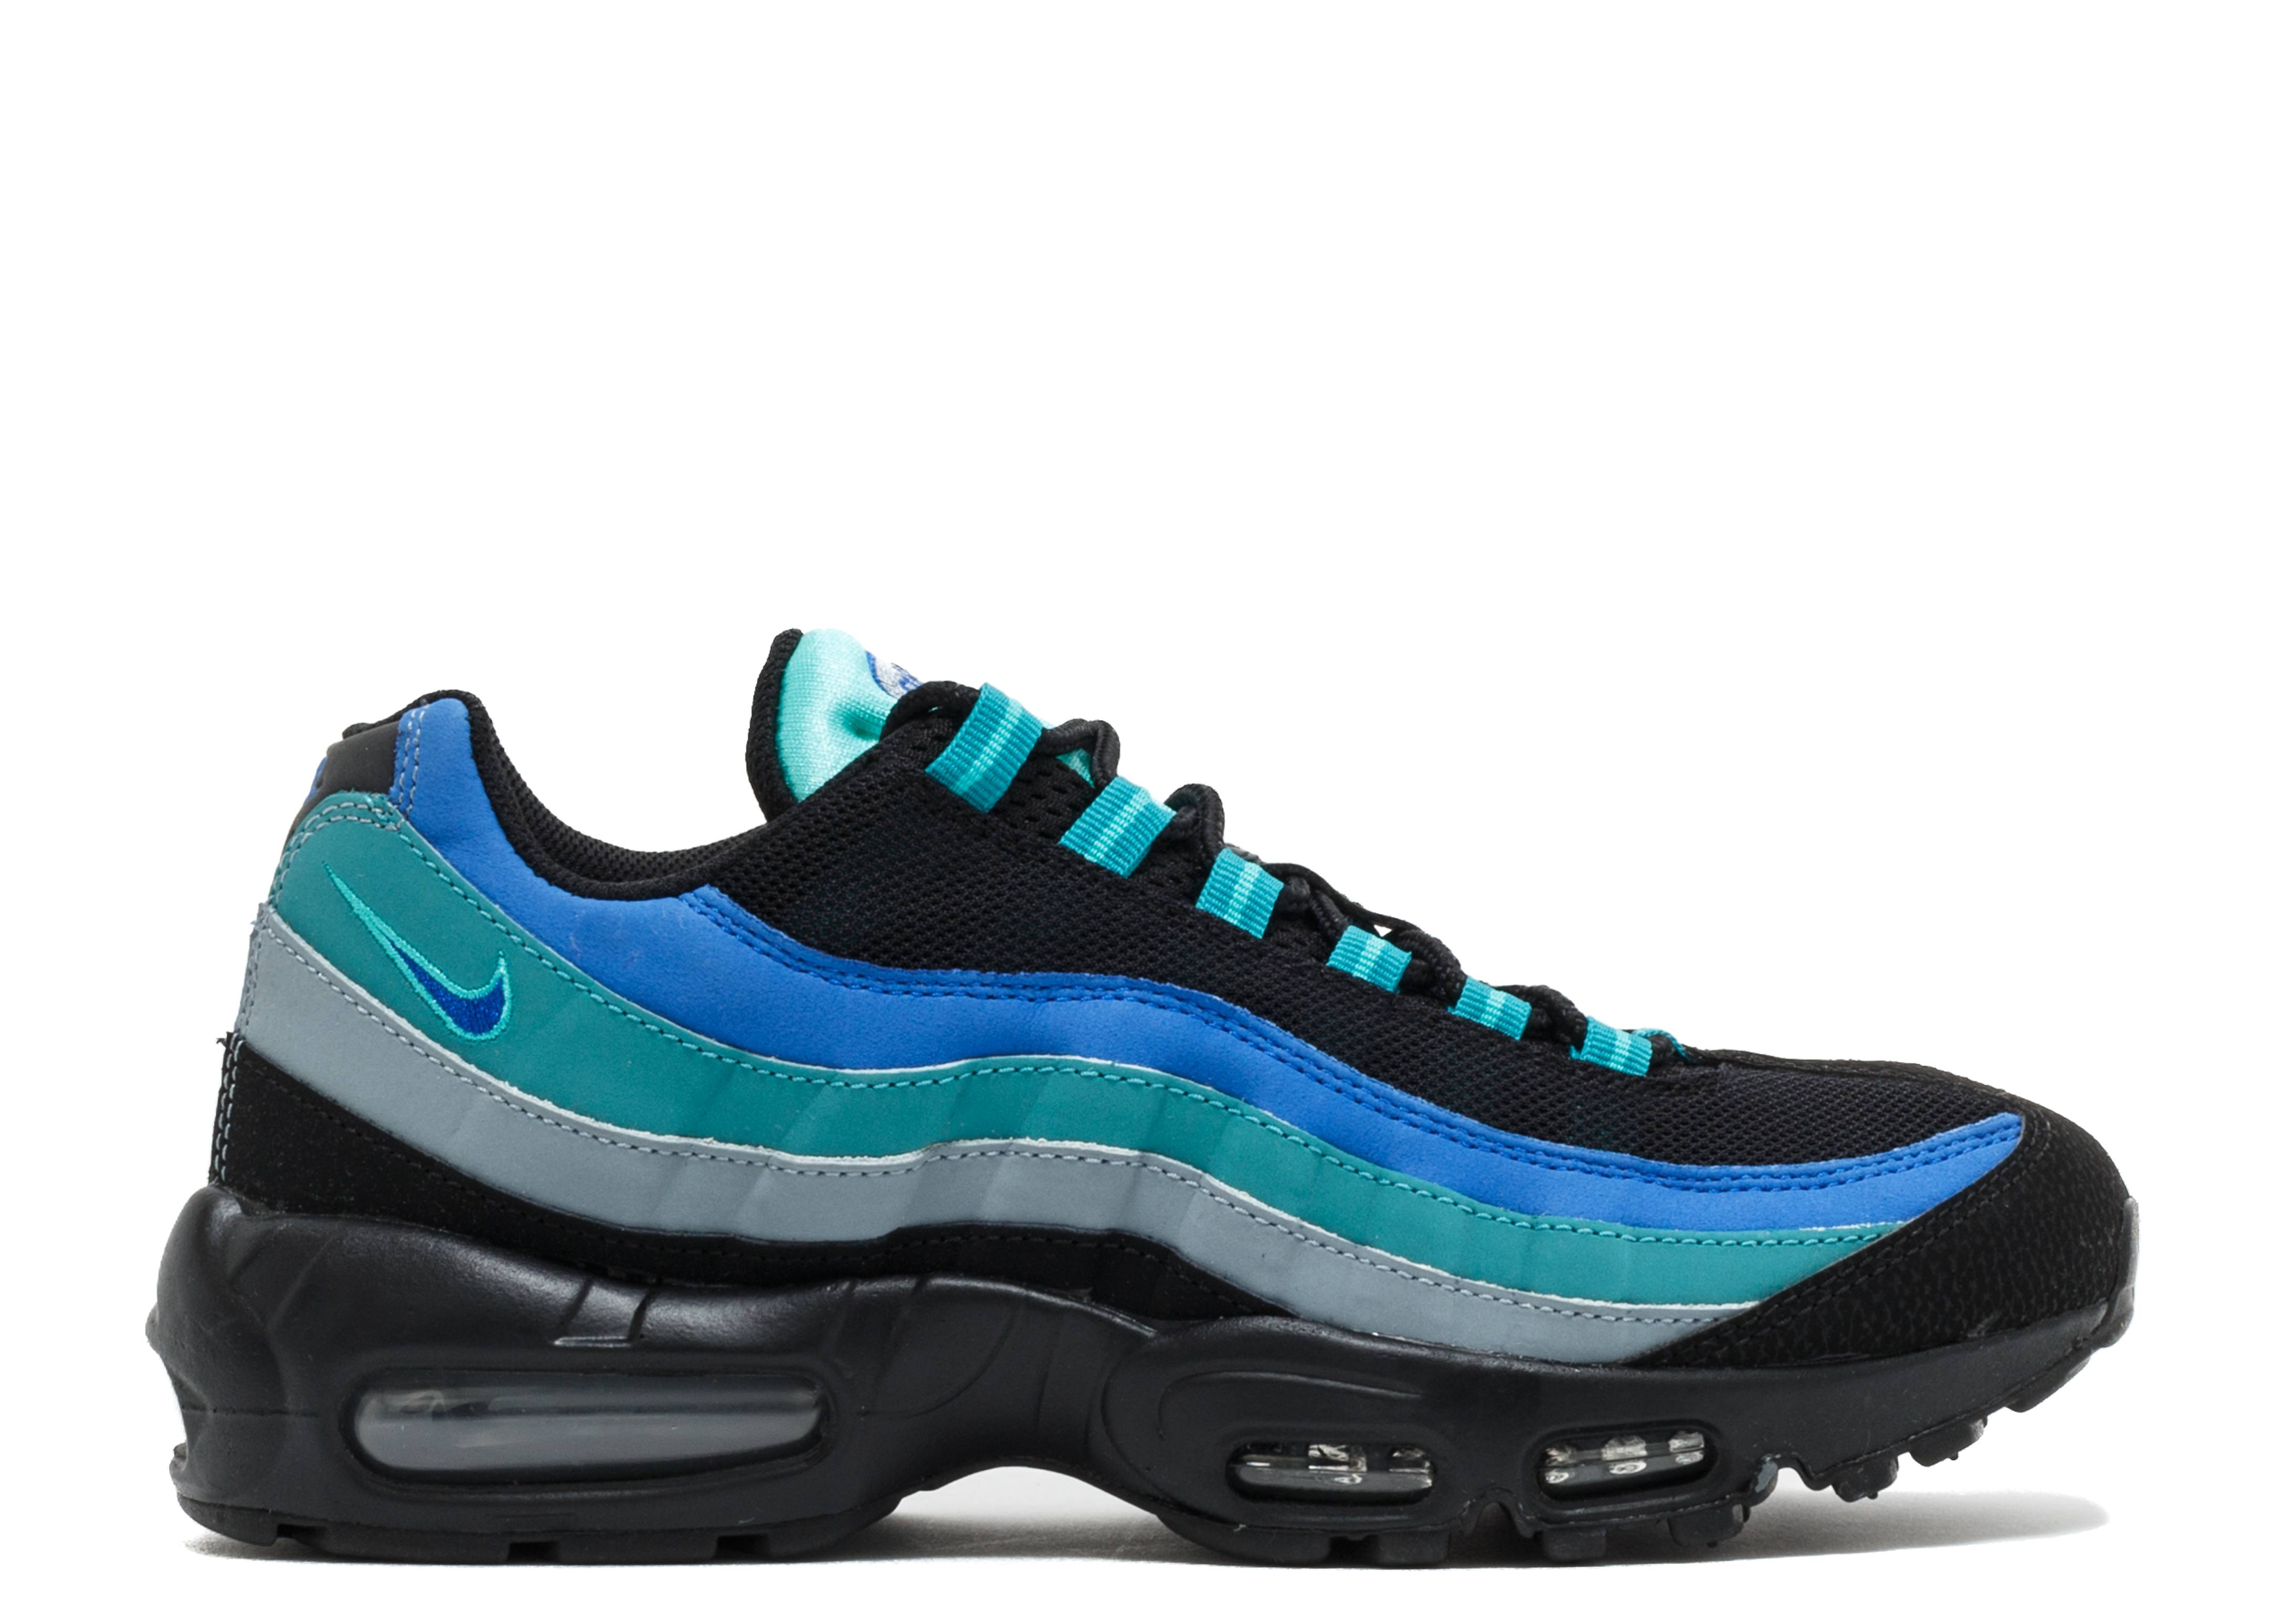 Air Max 95 Nike 609048 084 blackhyper cobalt catalina